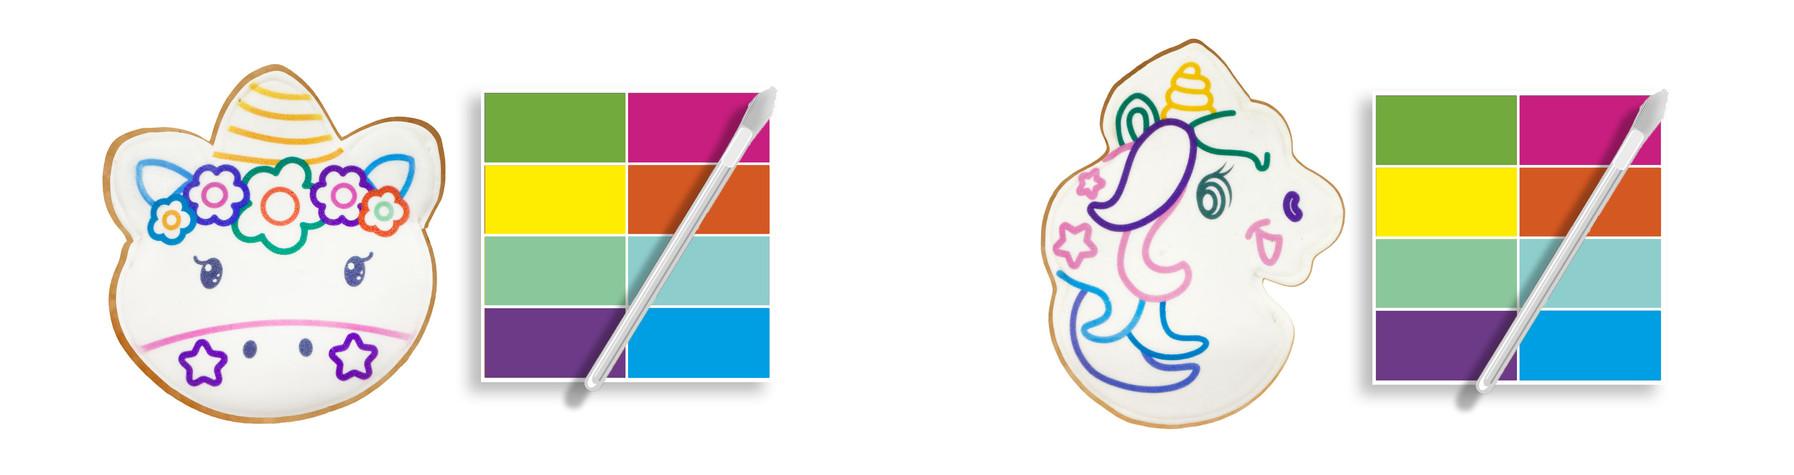 unicornios 2.jpg